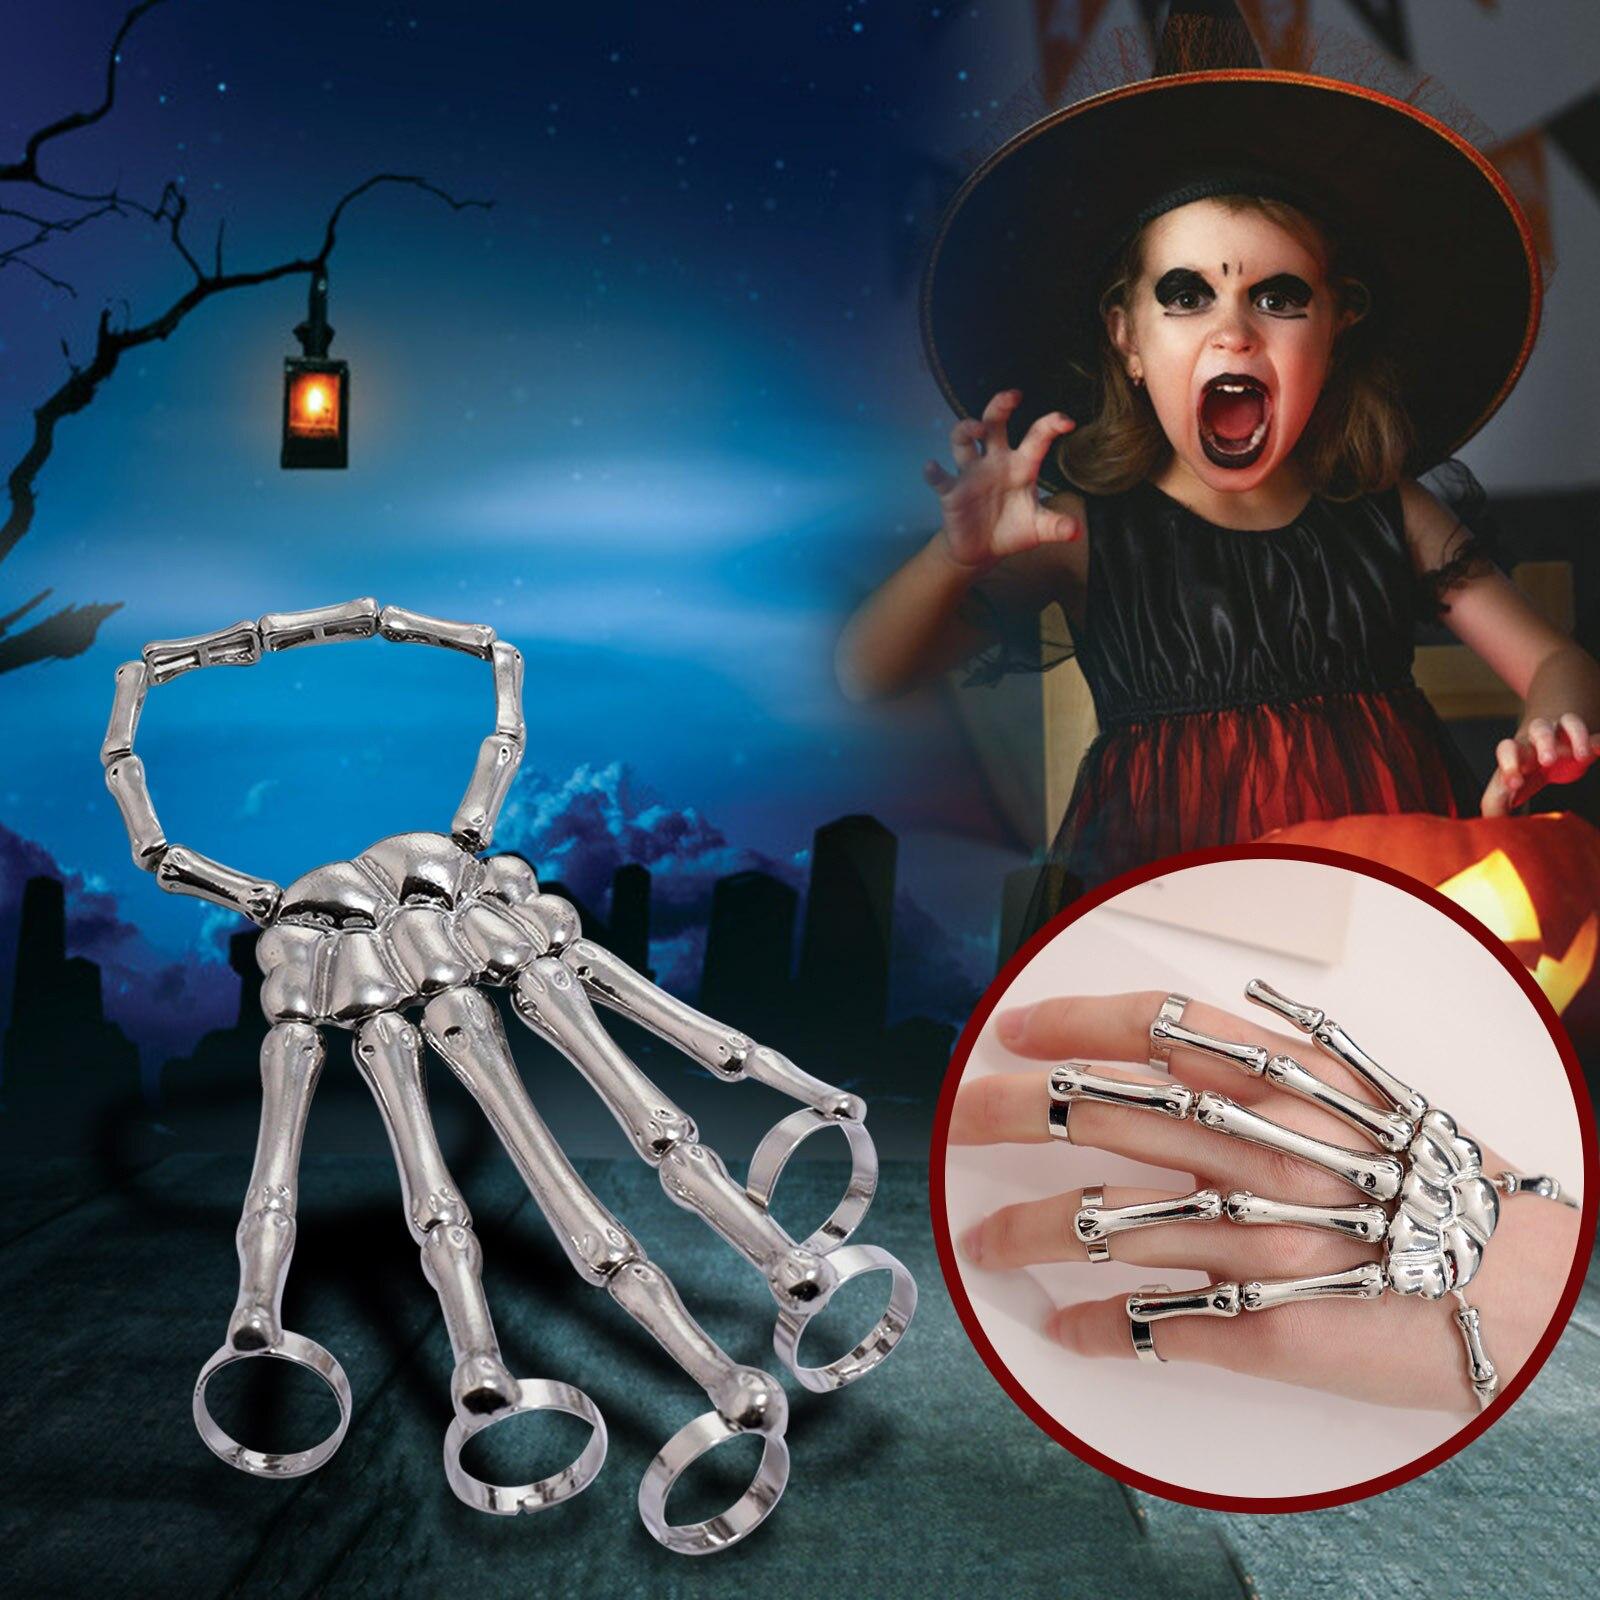 Halloween Bracelet Punk Steam Gothic Hand Skull Skeleton Elastic Adjustable Bangle Femme Party Accessorie Women Man Jewelry Gift